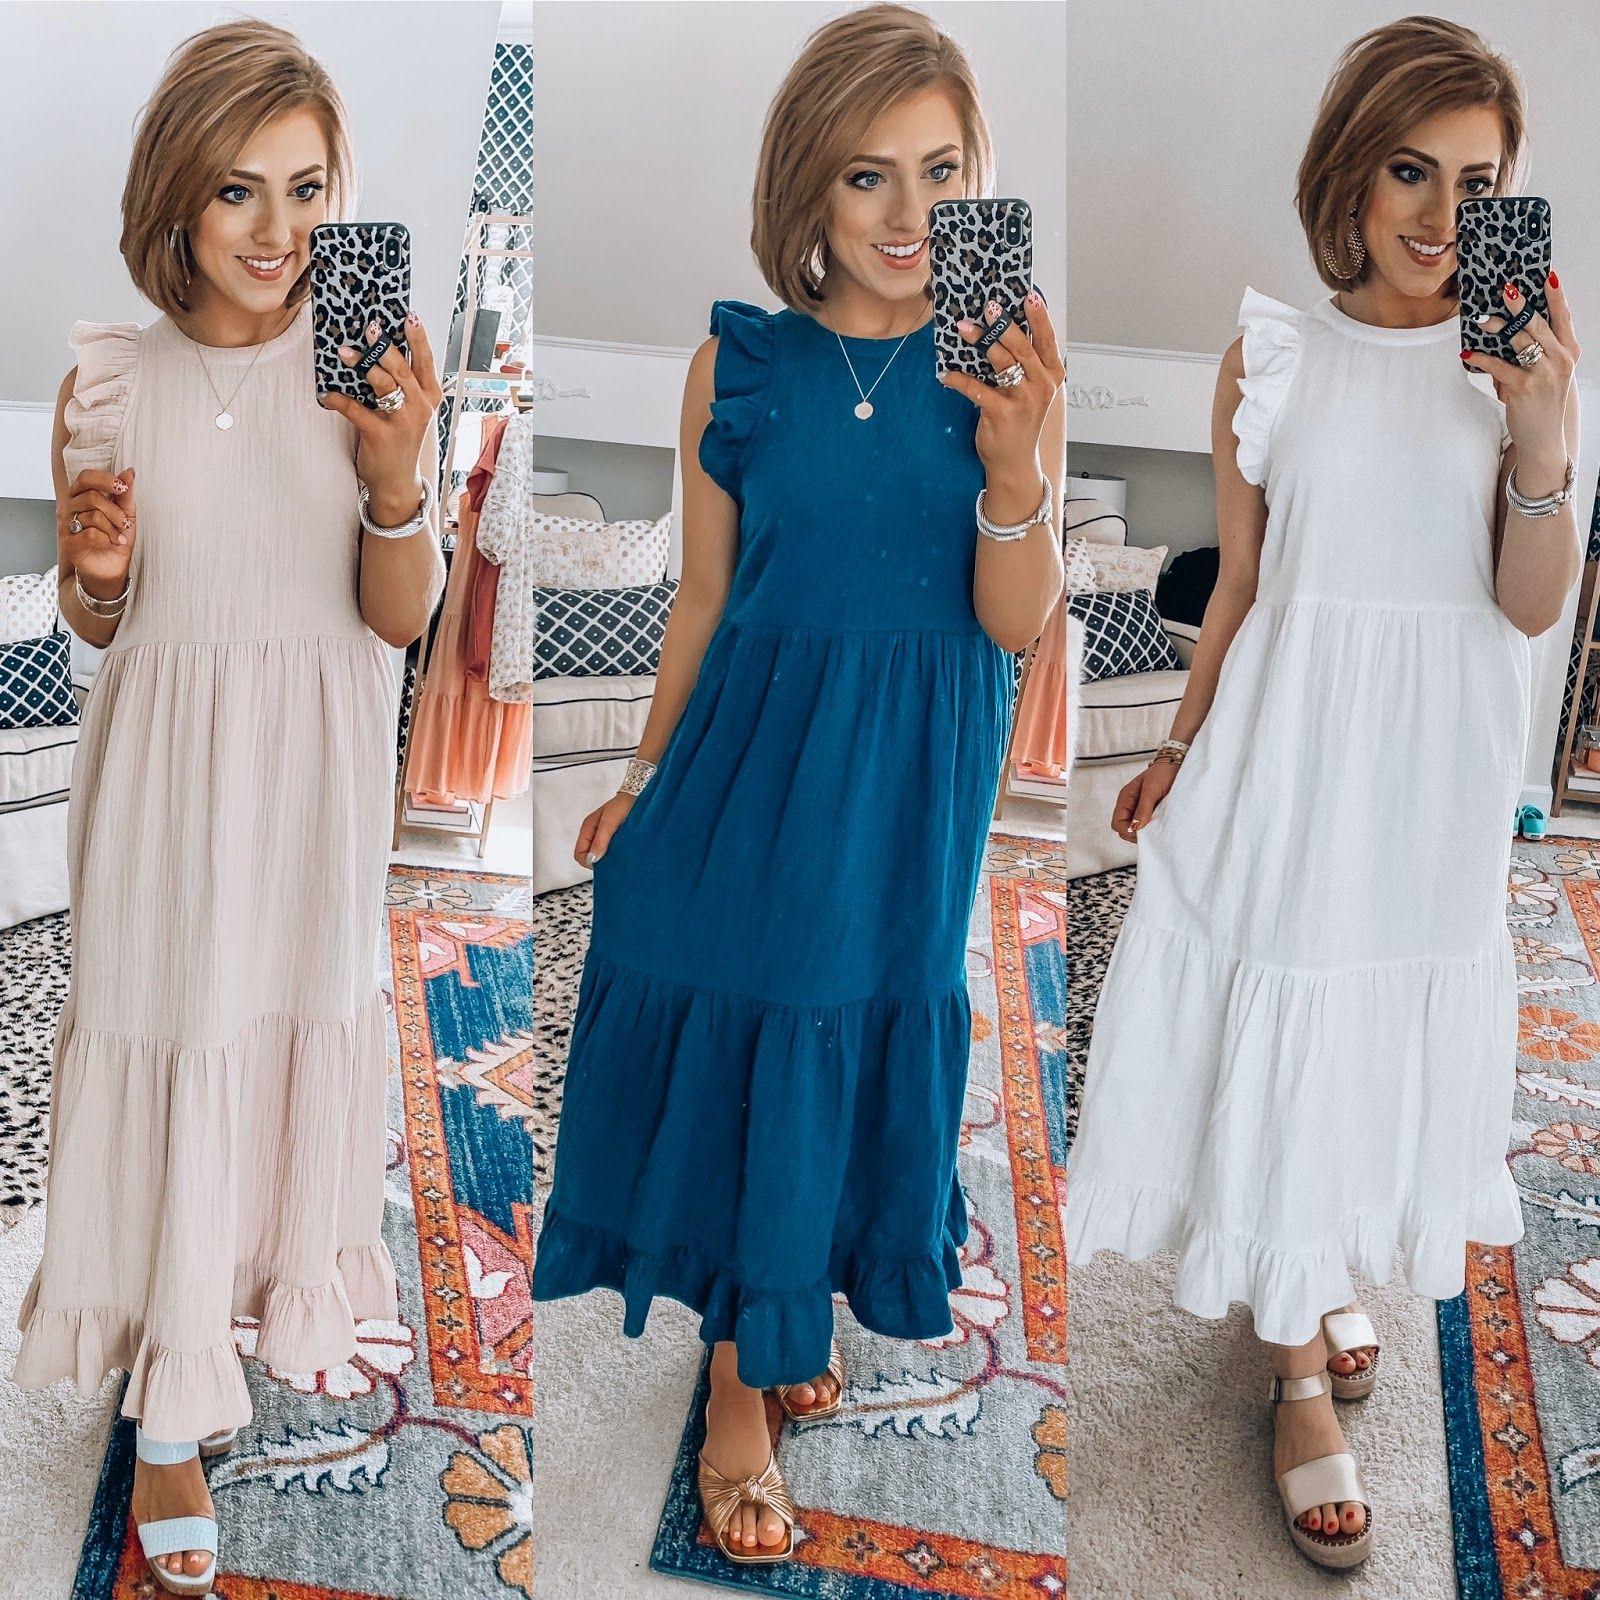 Something Delightful Target Dresses 2020 Target Dresses Target Style 2020 [ 1600 x 1600 Pixel ]